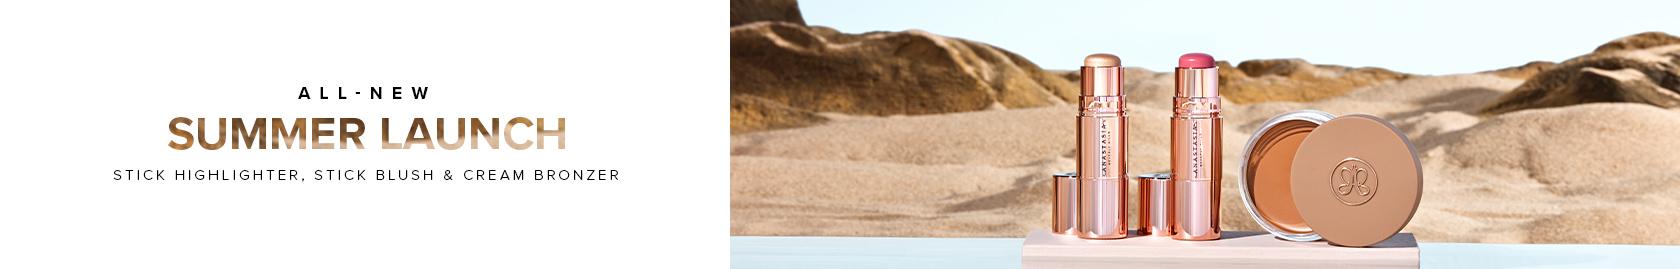 All New Summer Launch - Stick Highlighter, Stick Blush & Cream Bronzer